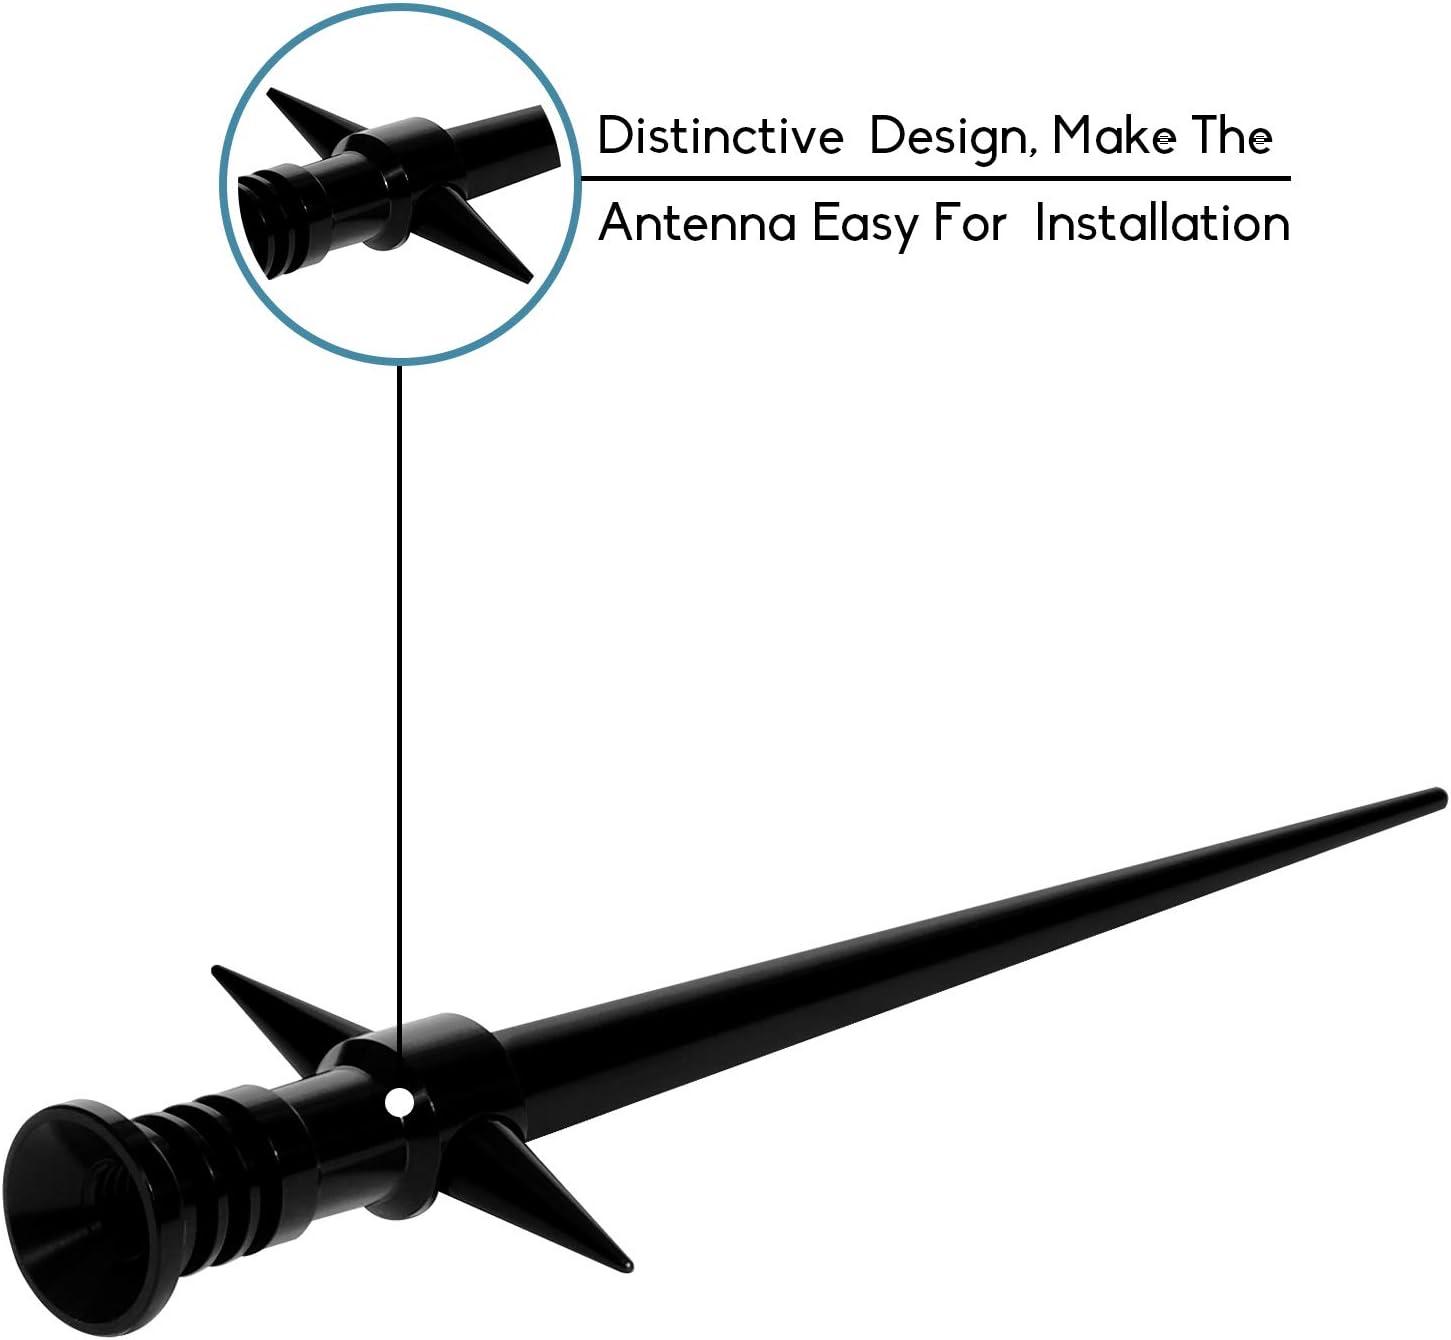 5.25 Inch LS02 DeepRoar Replacement Antenna for GMC Sierra 2007-2018 Black Optimized FM//AM Reception